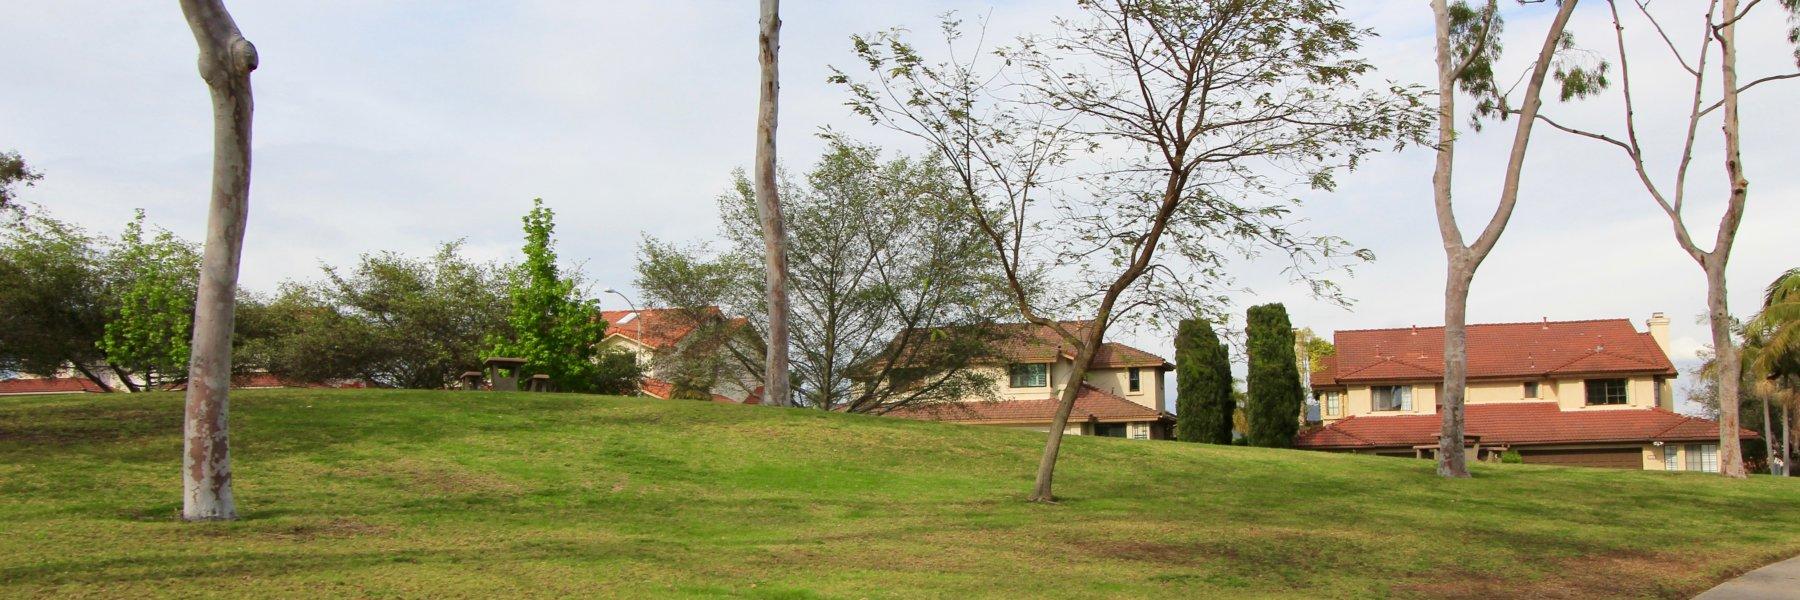 Fieldstone is a community of homes in Encinitas California